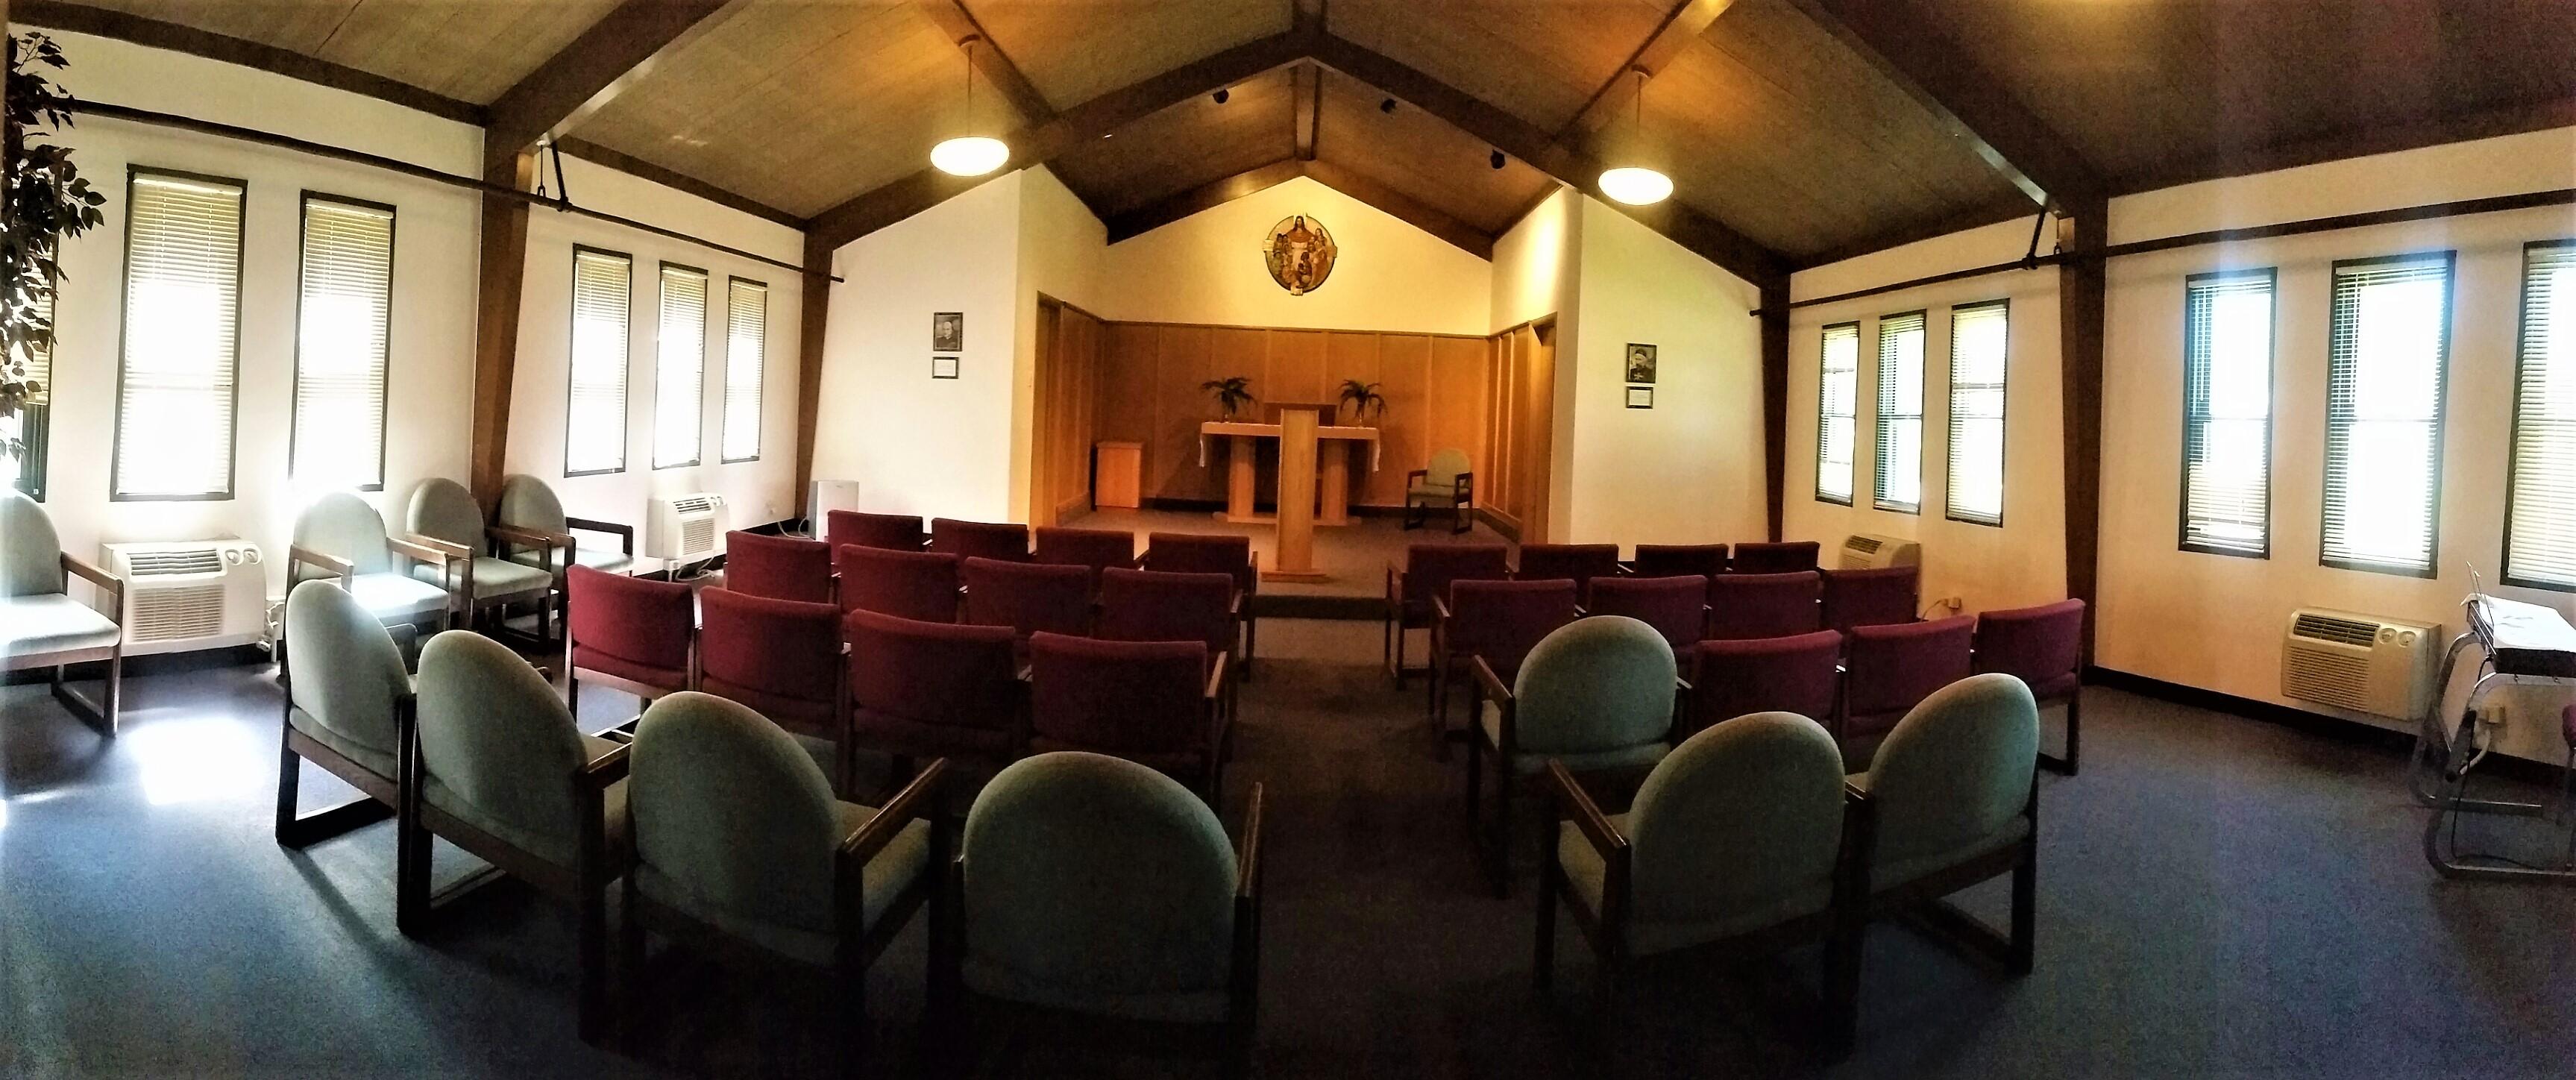 MH Chapel